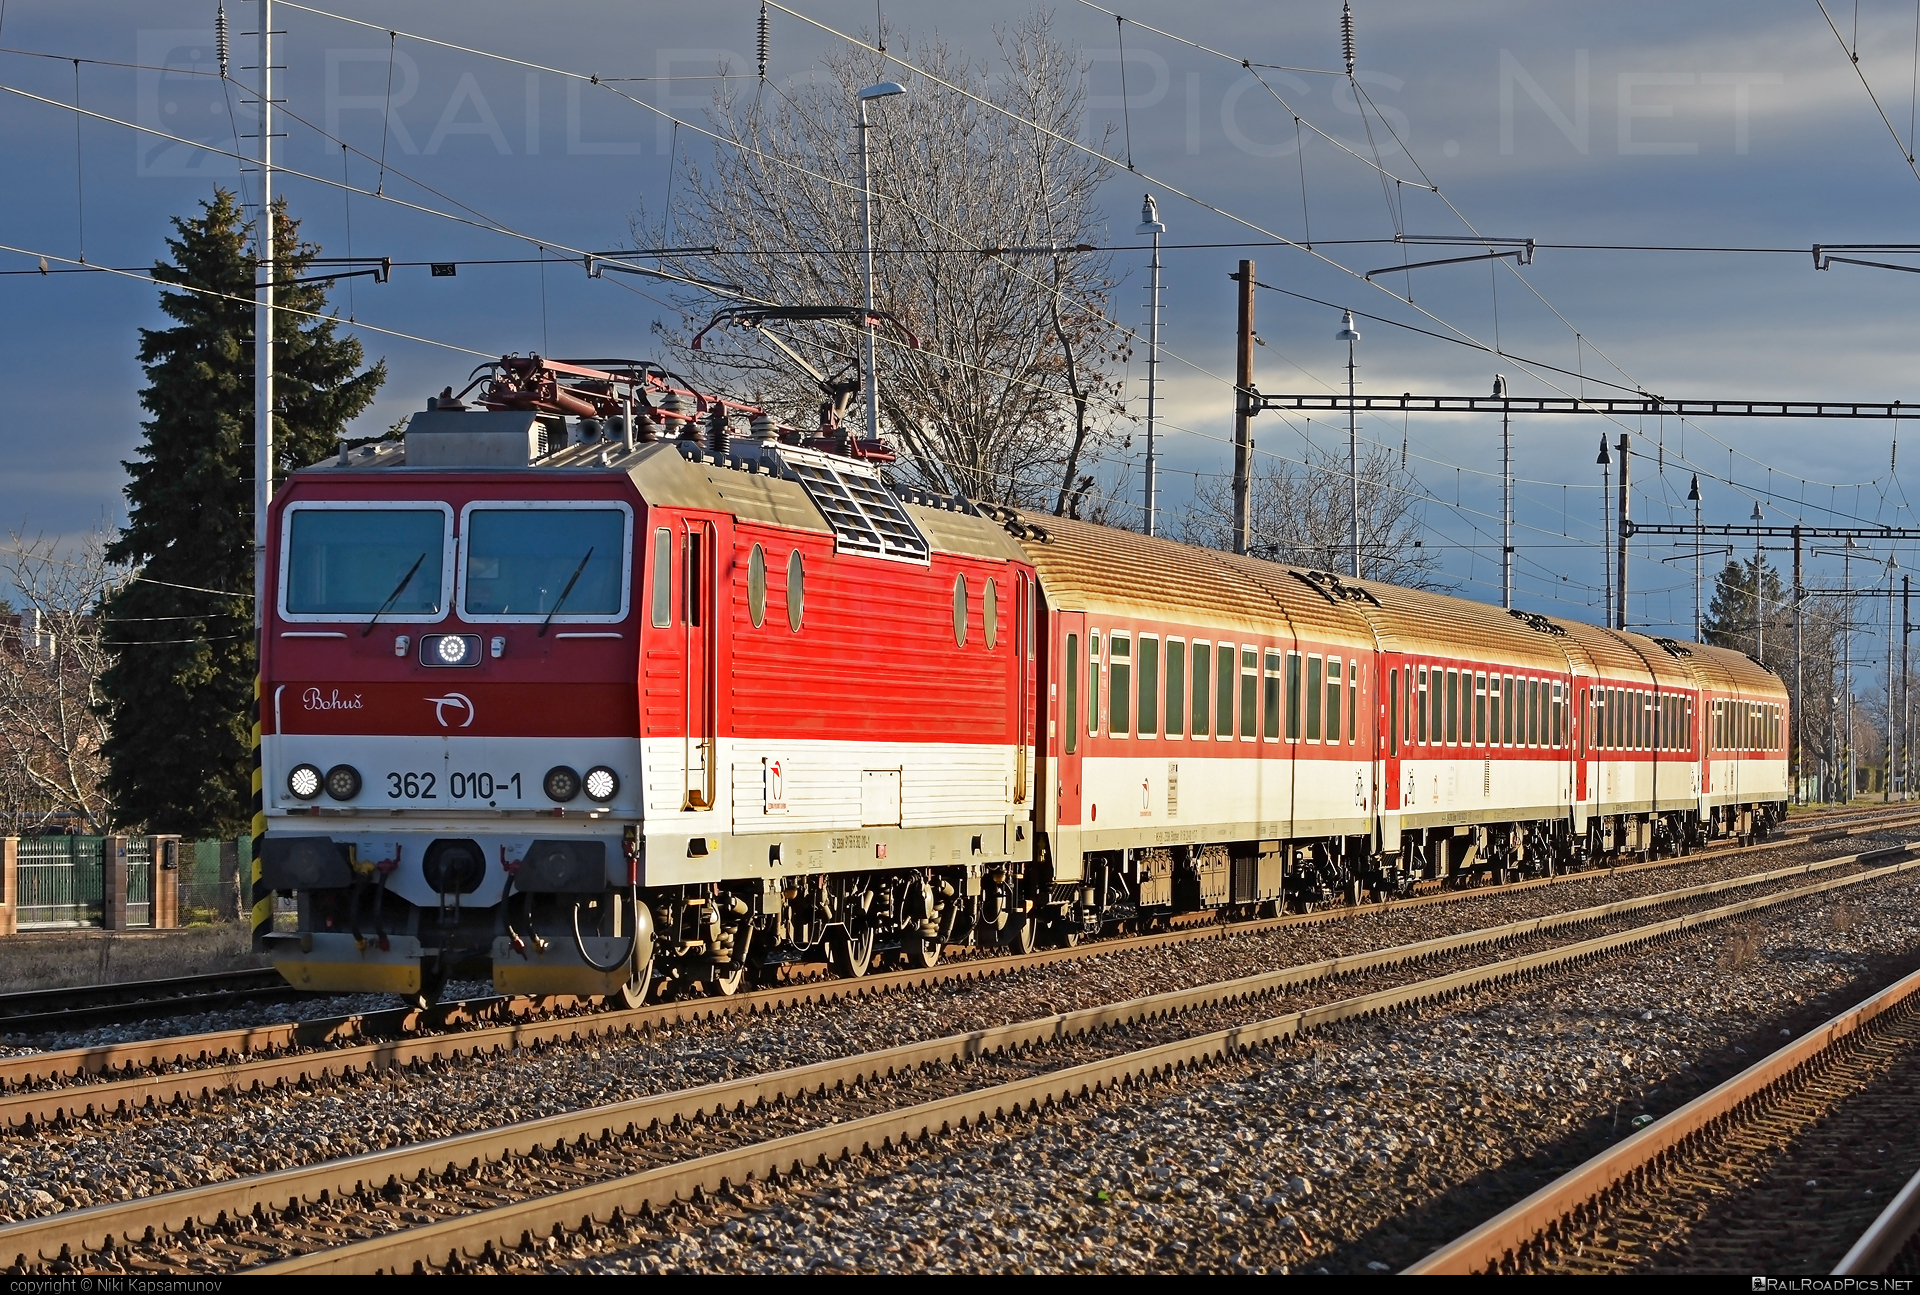 Škoda 69Er - 362 010-1 operated by Železničná Spoločnost' Slovensko, a.s. #ZeleznicnaSpolocnostSlovensko #eso #locomotive362 #rychleeso #skoda #skoda69er #zssk